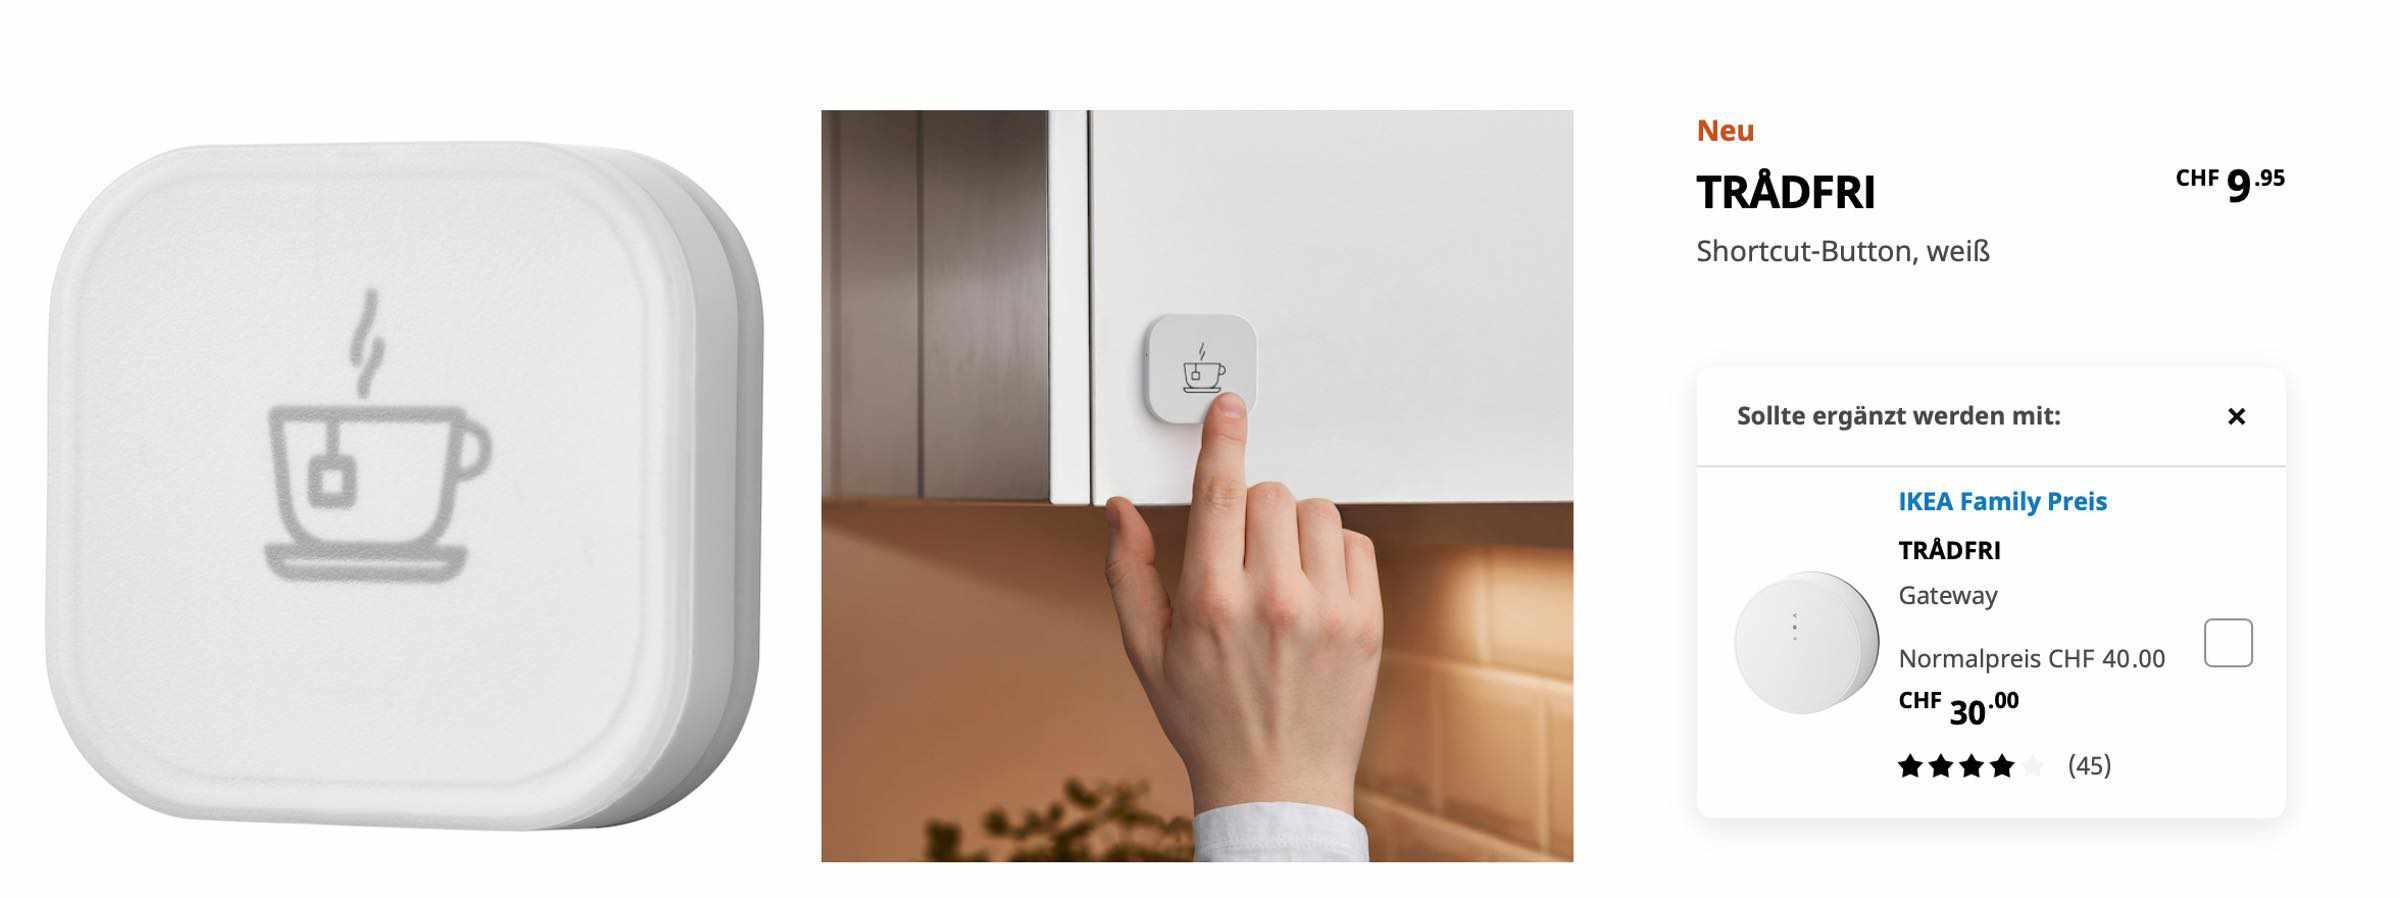 IKEA Shortcut-Button – Endlich online verfügbar